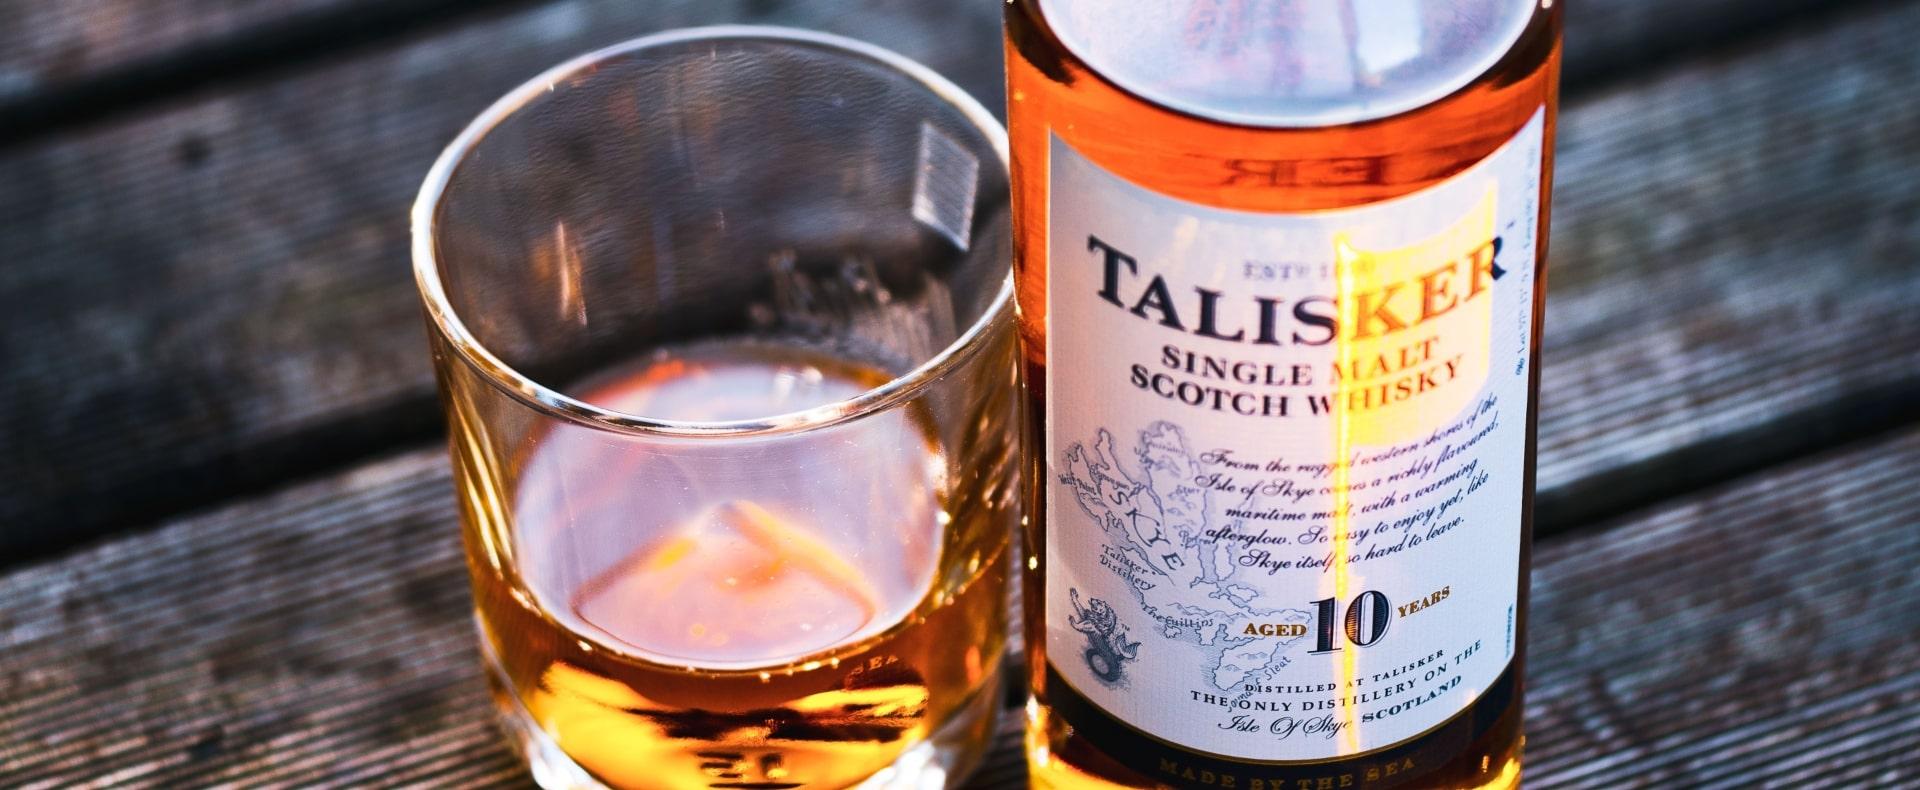 Talisker Distillery Experience Gallery